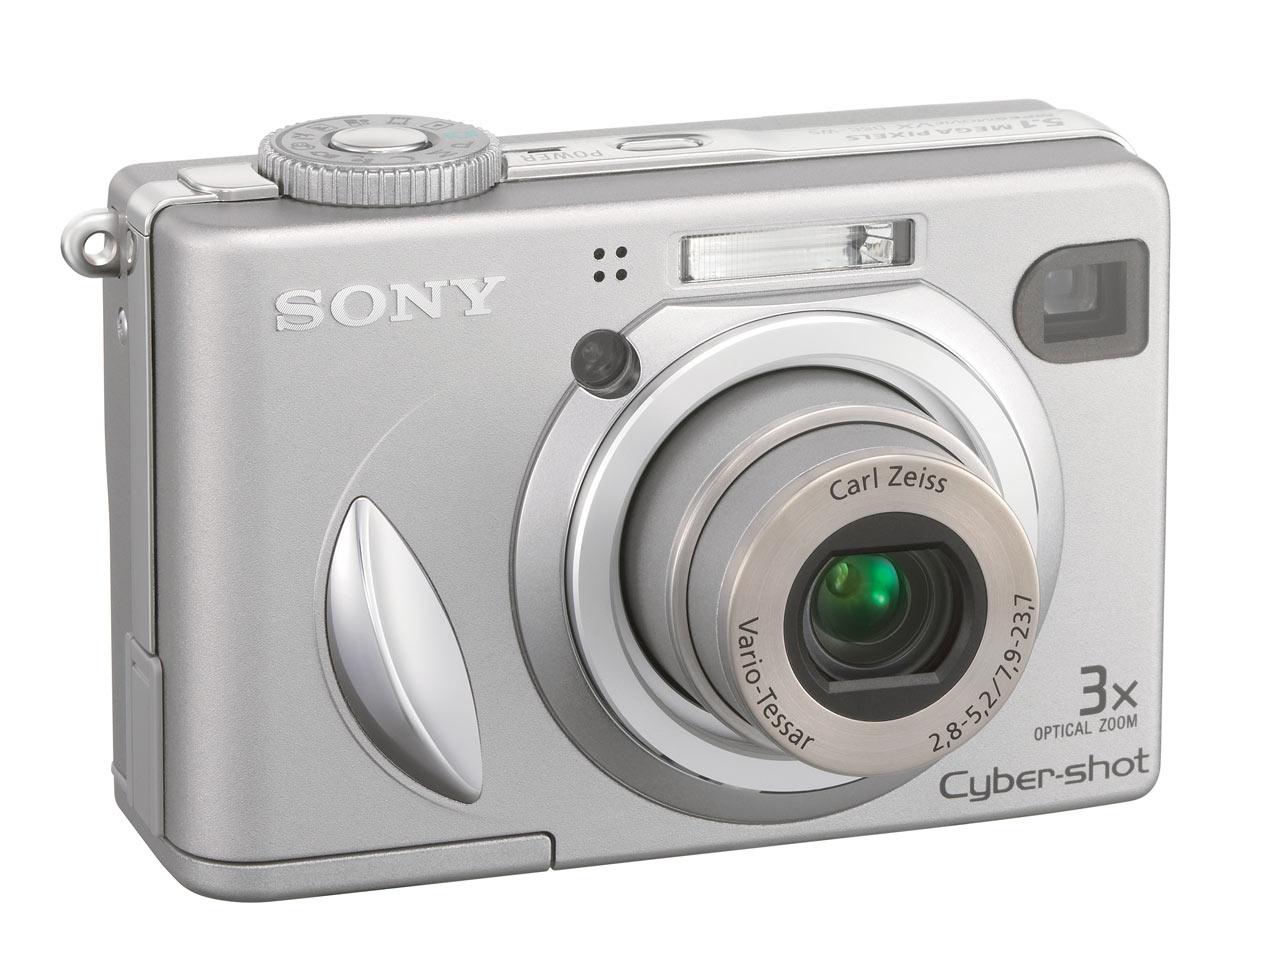 Sony Cyber Shot Dsc W5 And Dsc W7 Digital Photography Review